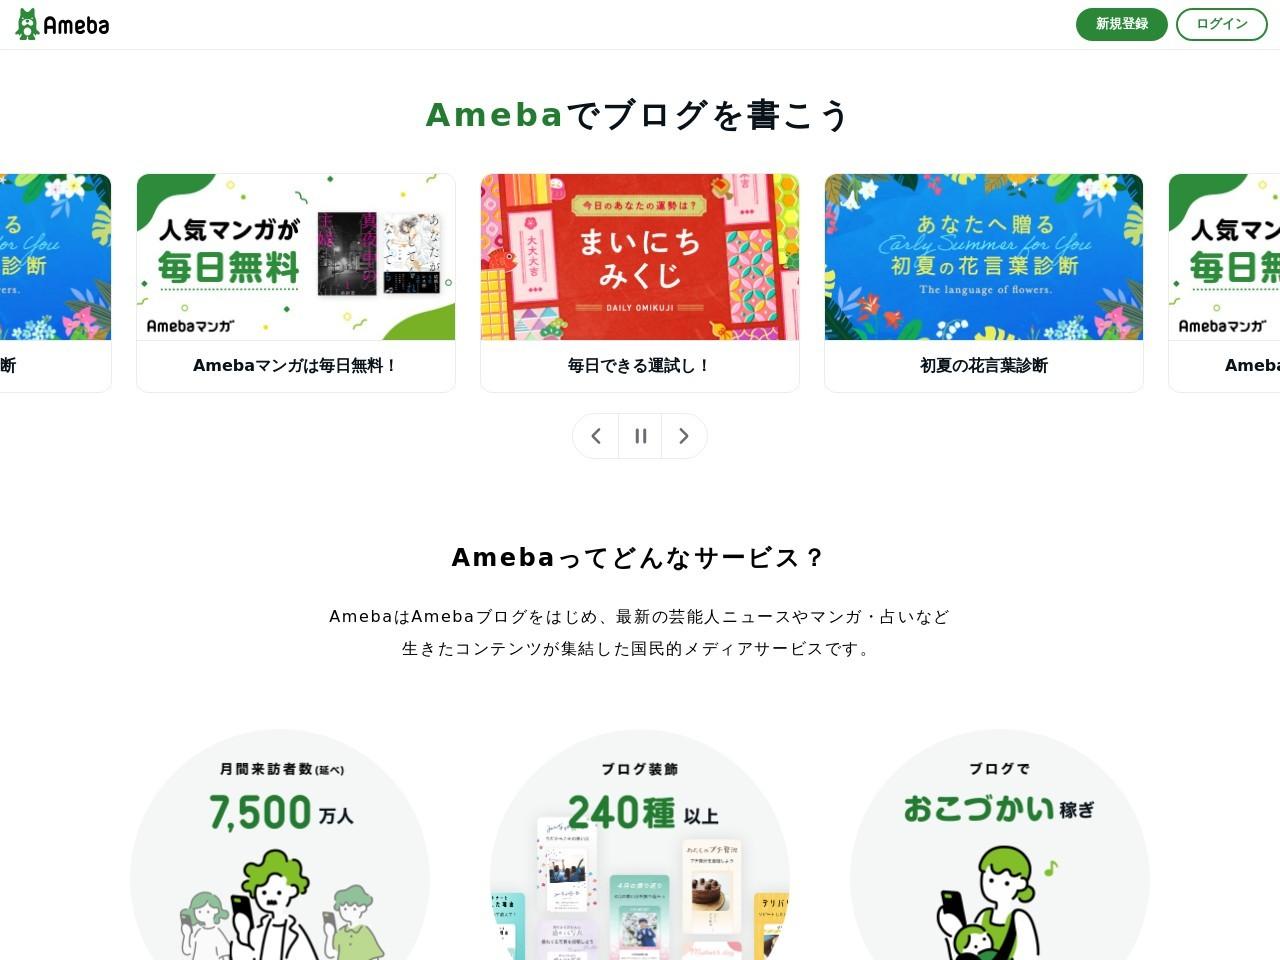 http://ameblo.jp/88-95-24/entry-12016398227.html